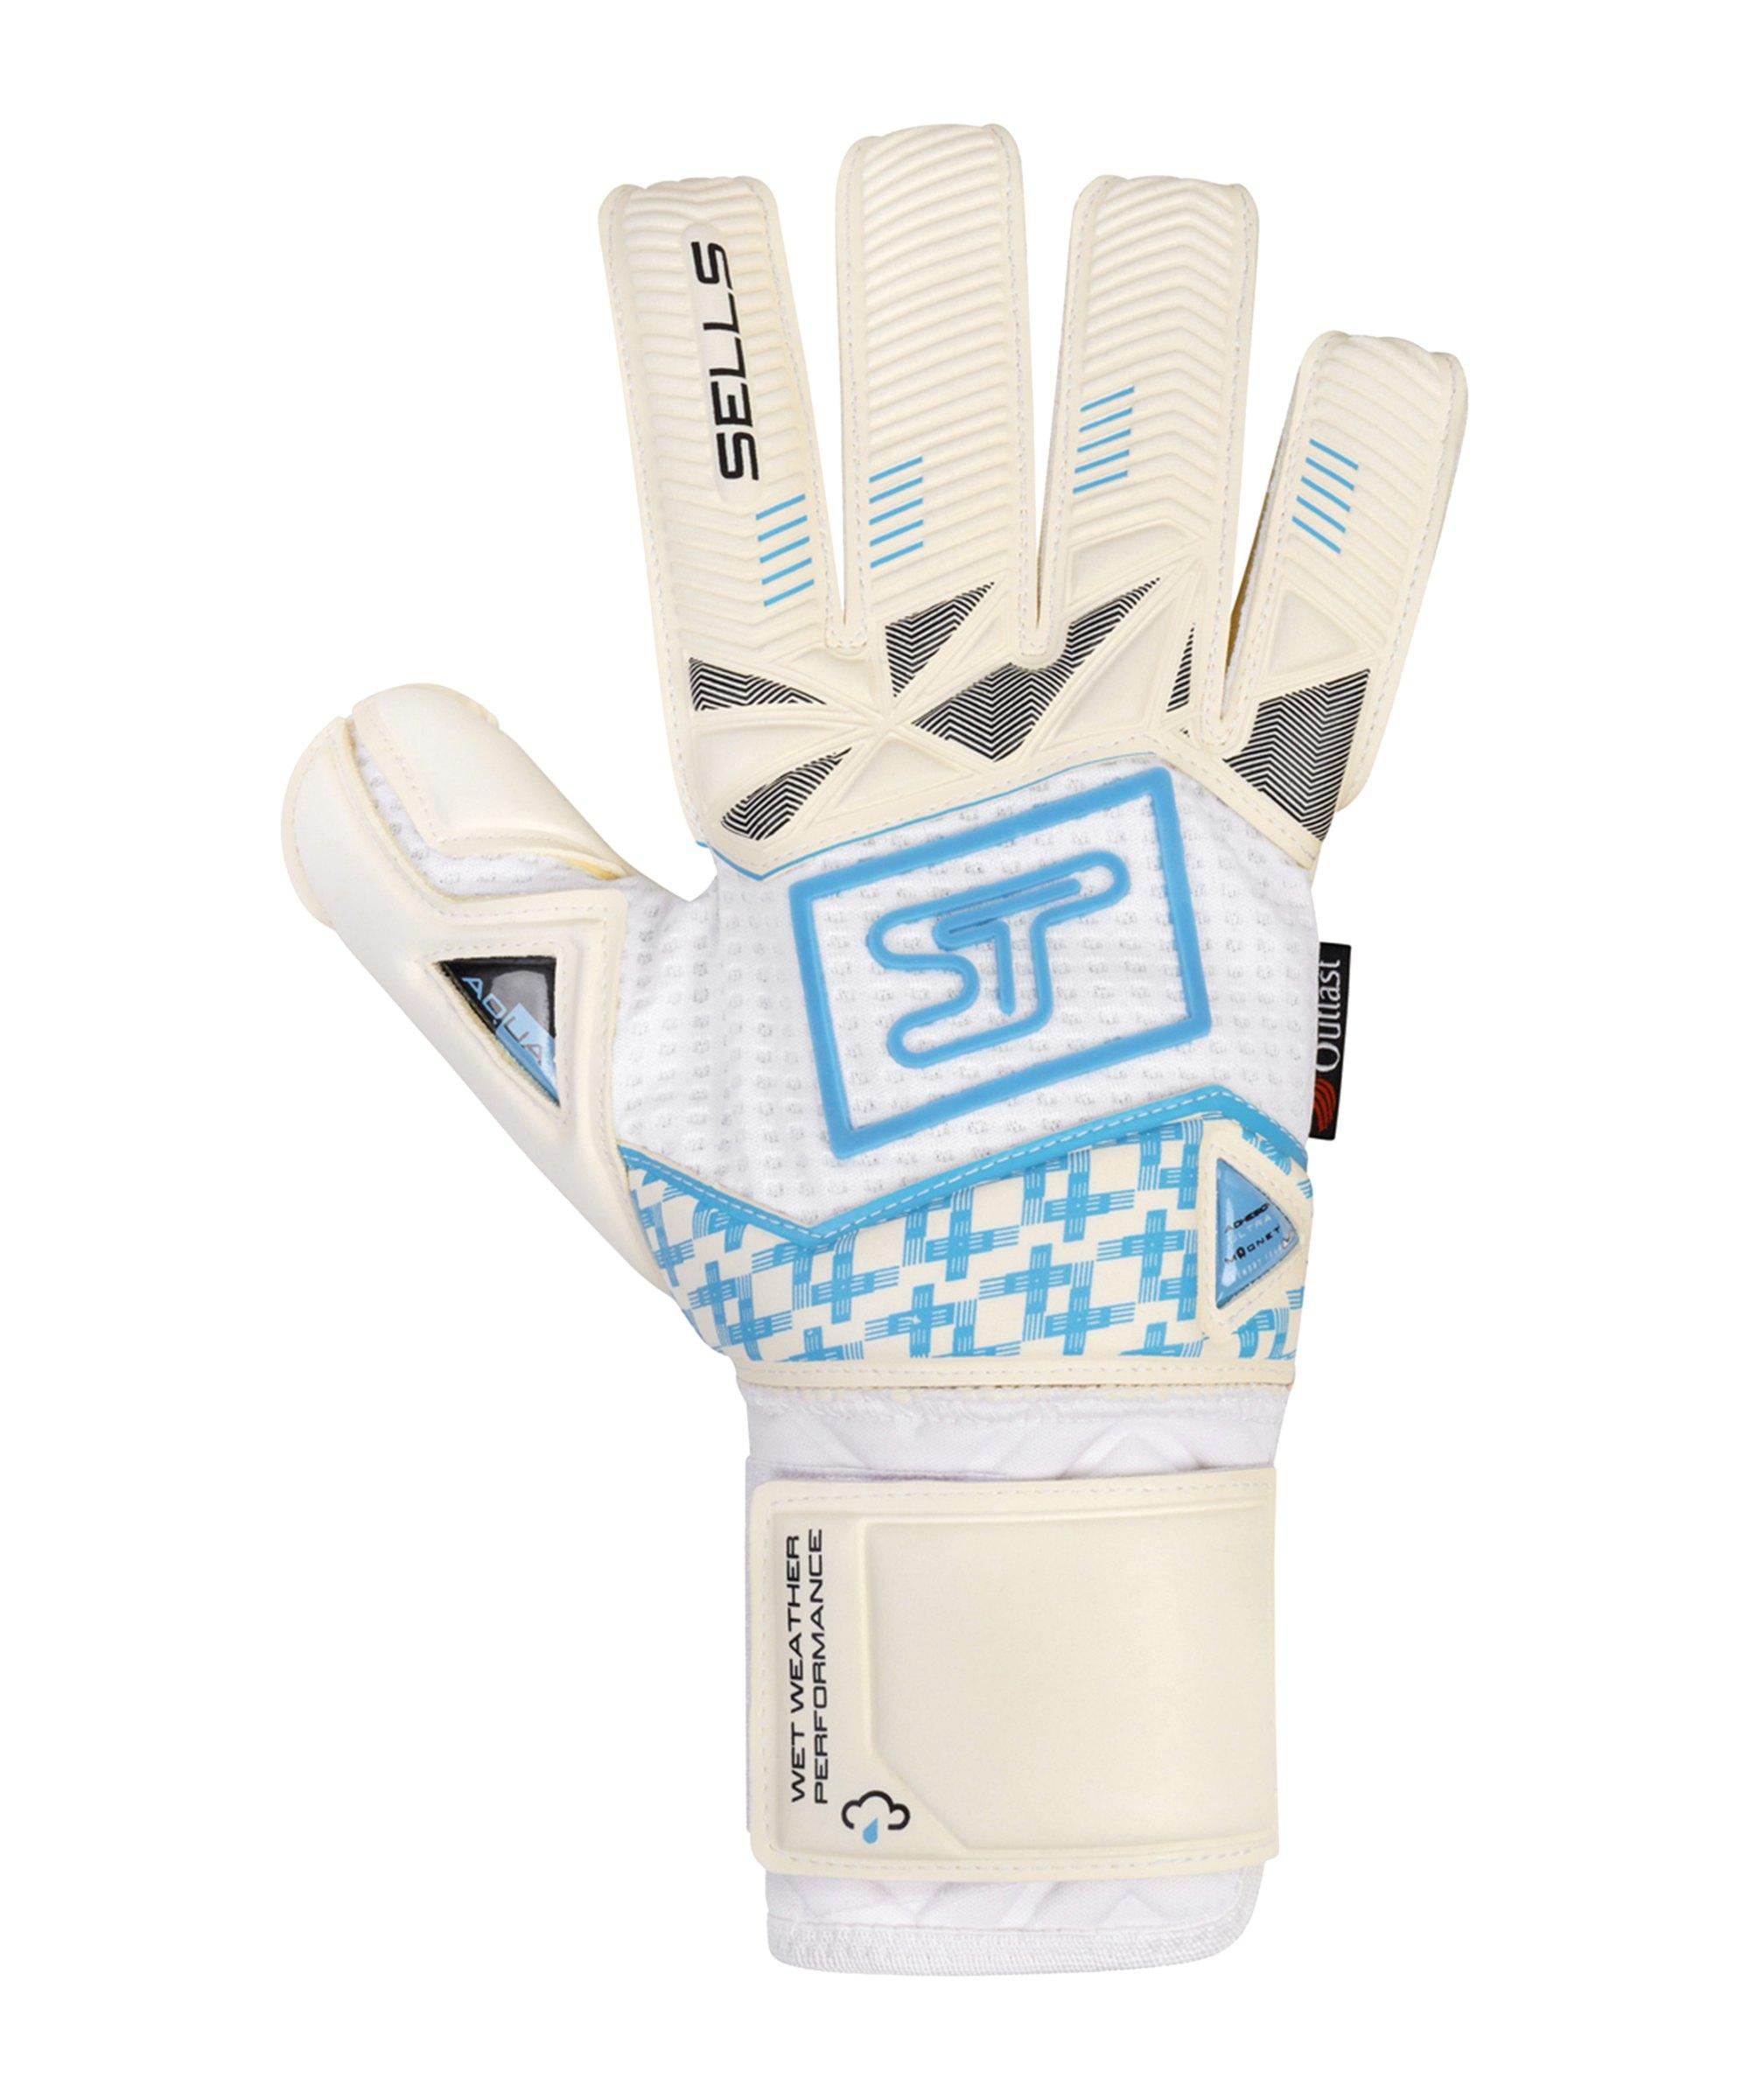 Sells F3 Aqua Ultimate TW-Handschuh Weiss Schwarz Blau - weiss